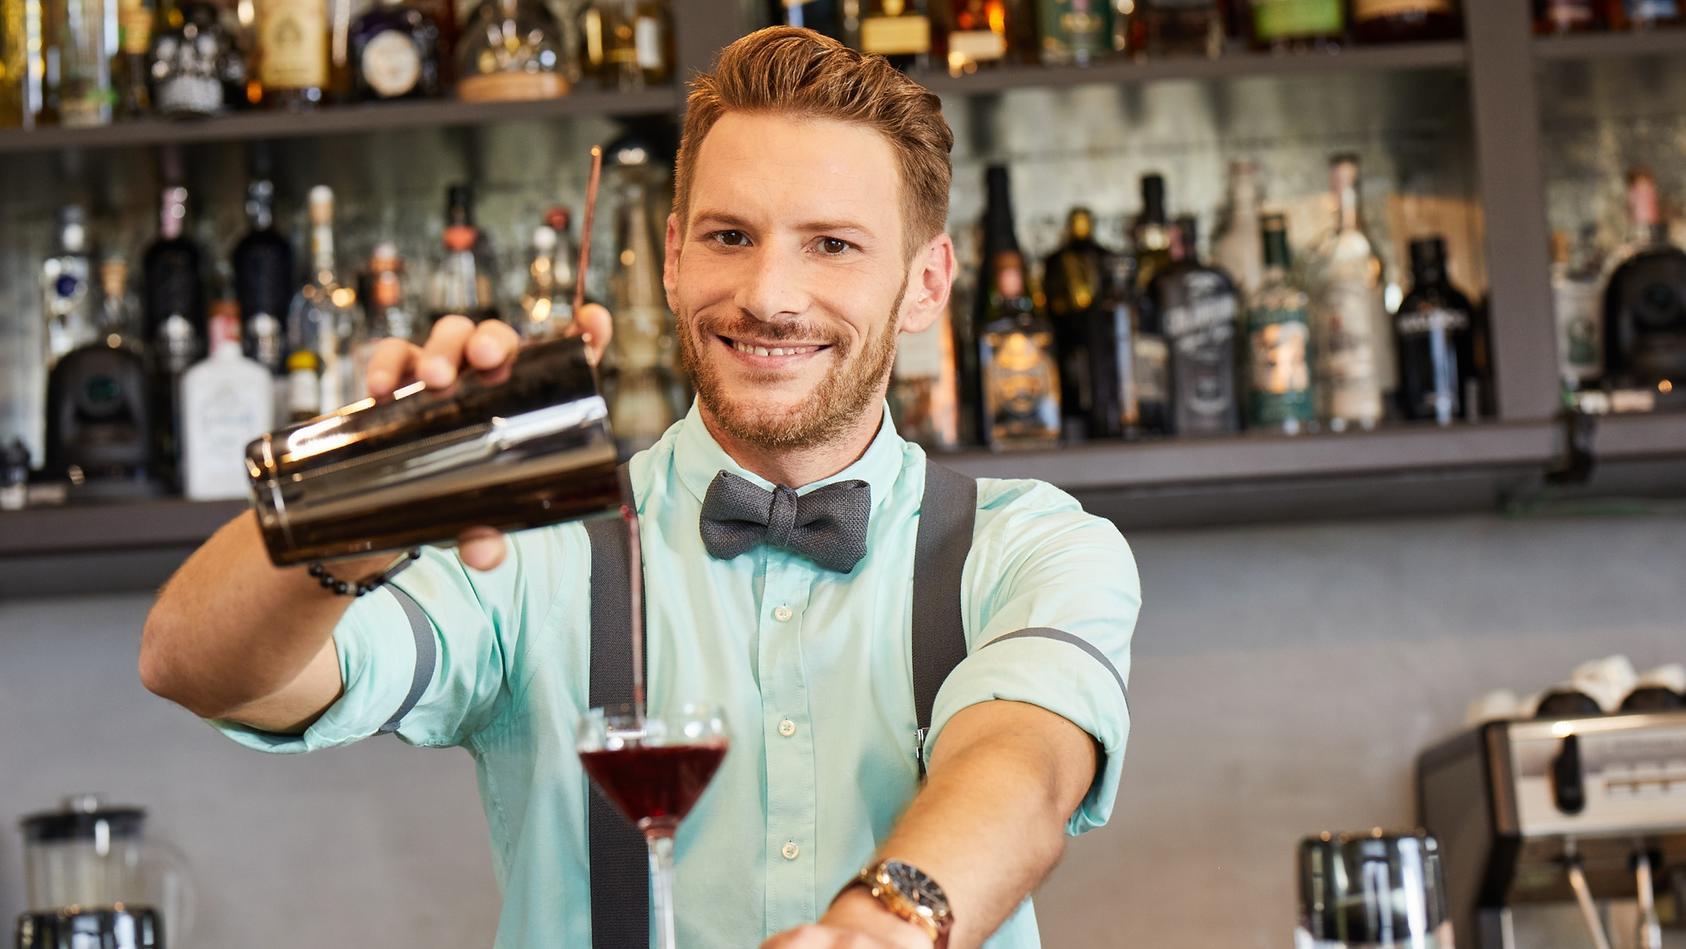 Barkeeper Rocco